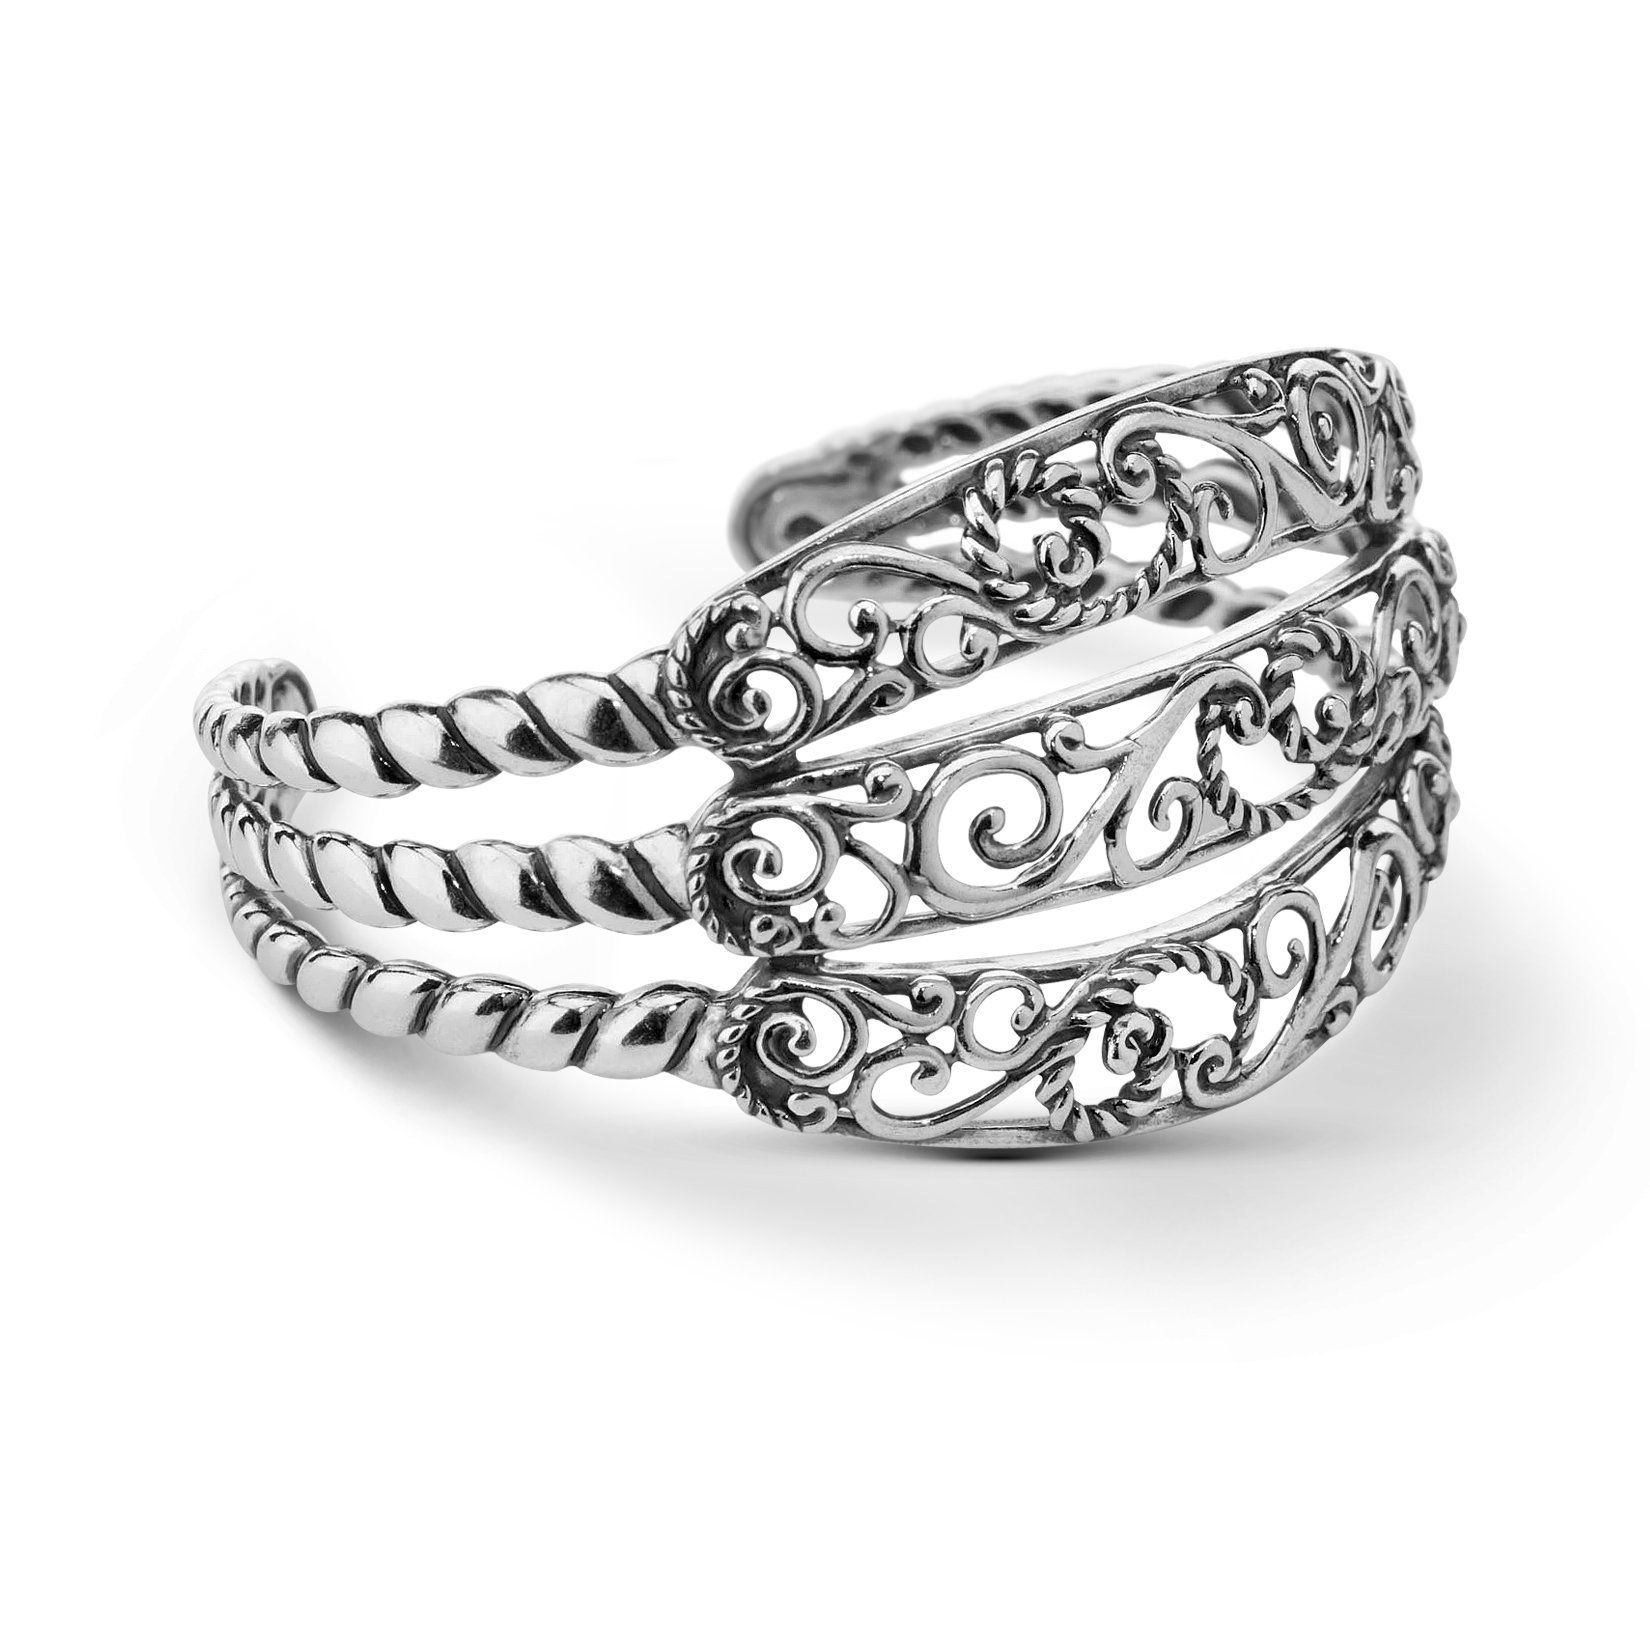 Carolyn Pollack Signature Genuine .925 Sterling Silver Three Row Cuff Bracelet